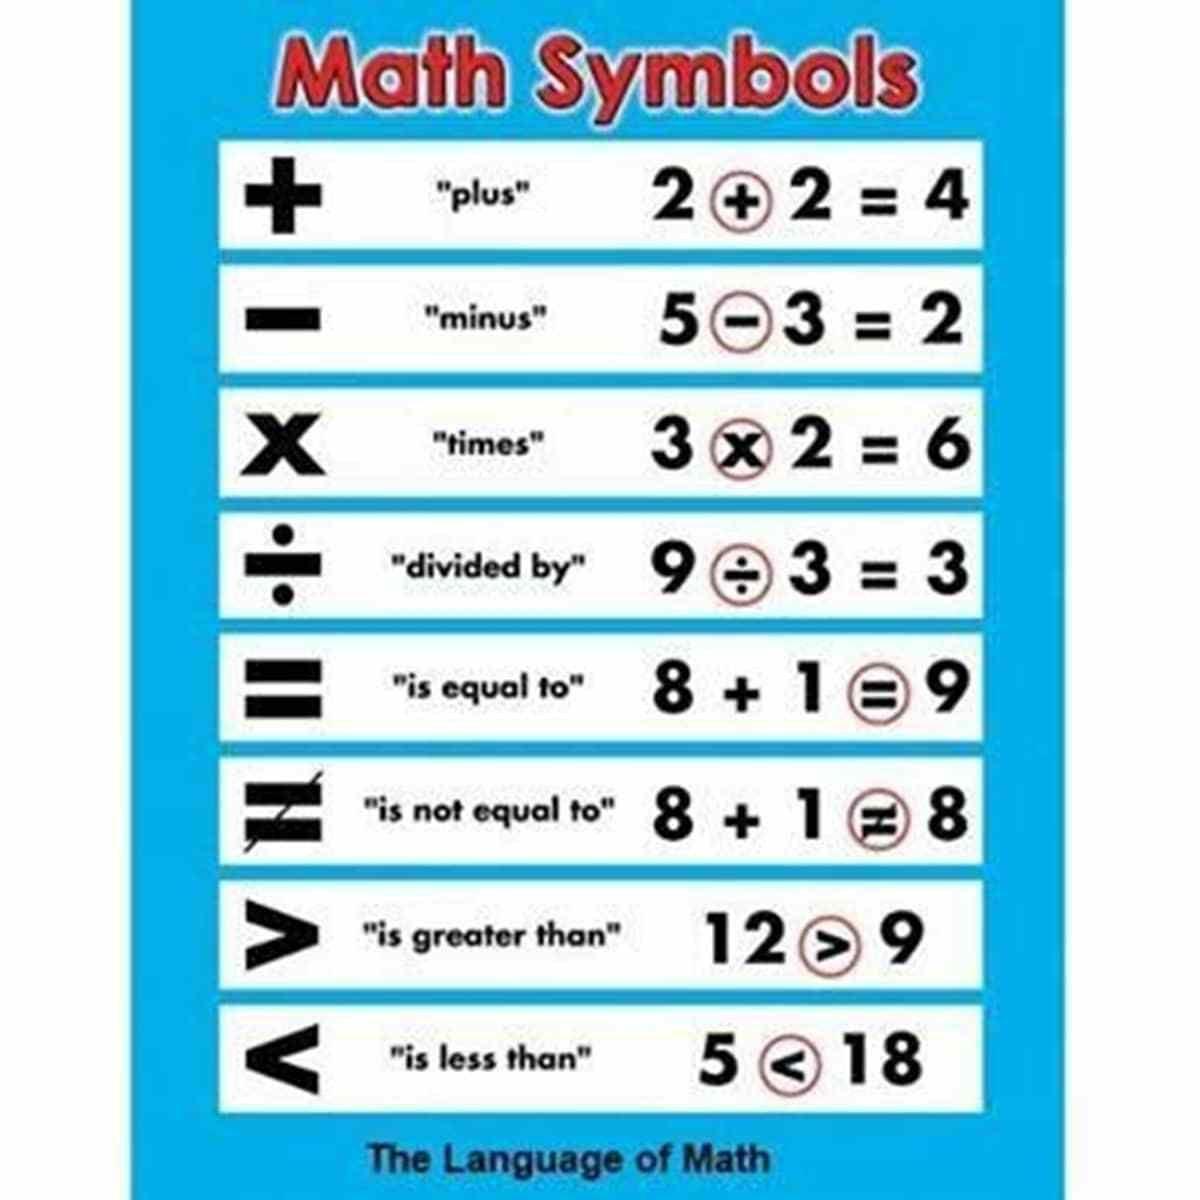 Math symbols in English | Vocabulary | Pinterest | Symbols, Math and ...